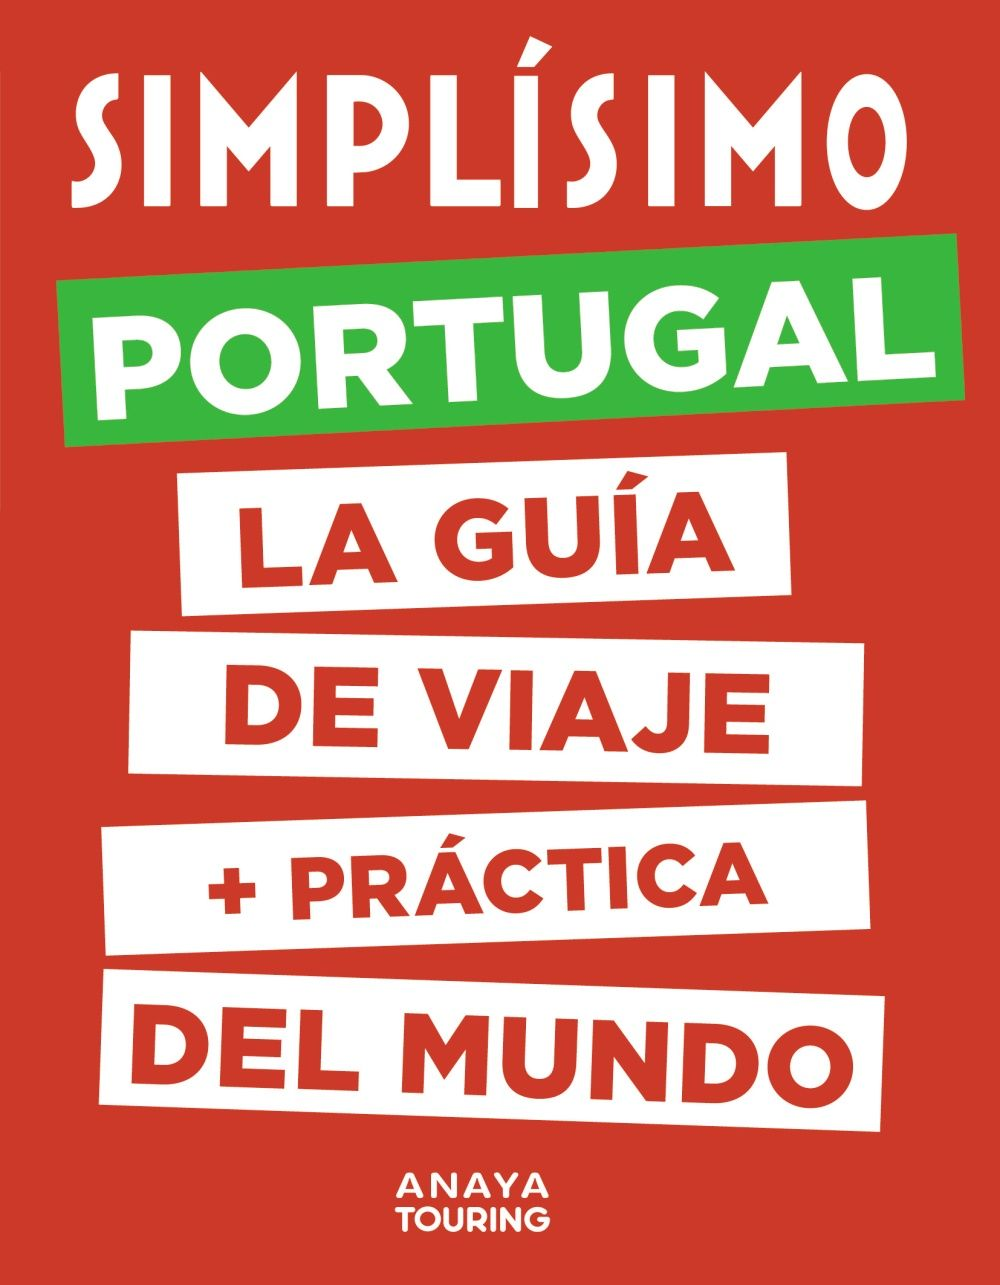 PORTUGAL SIMPLISIMO